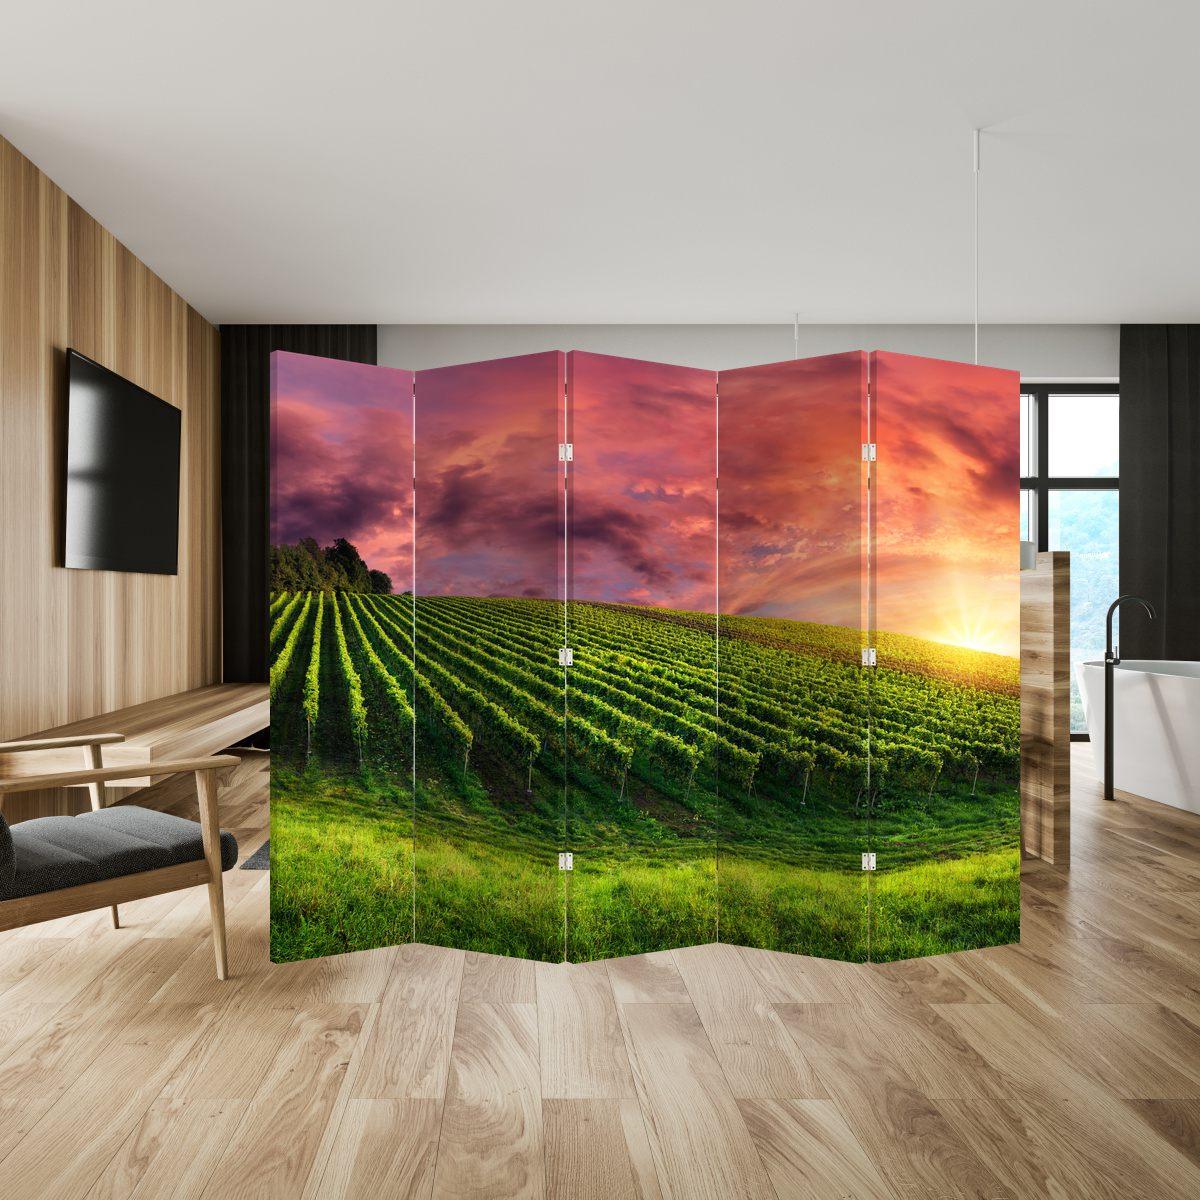 Paraván - Vinohrad s barevným nebem (P020336P225180)